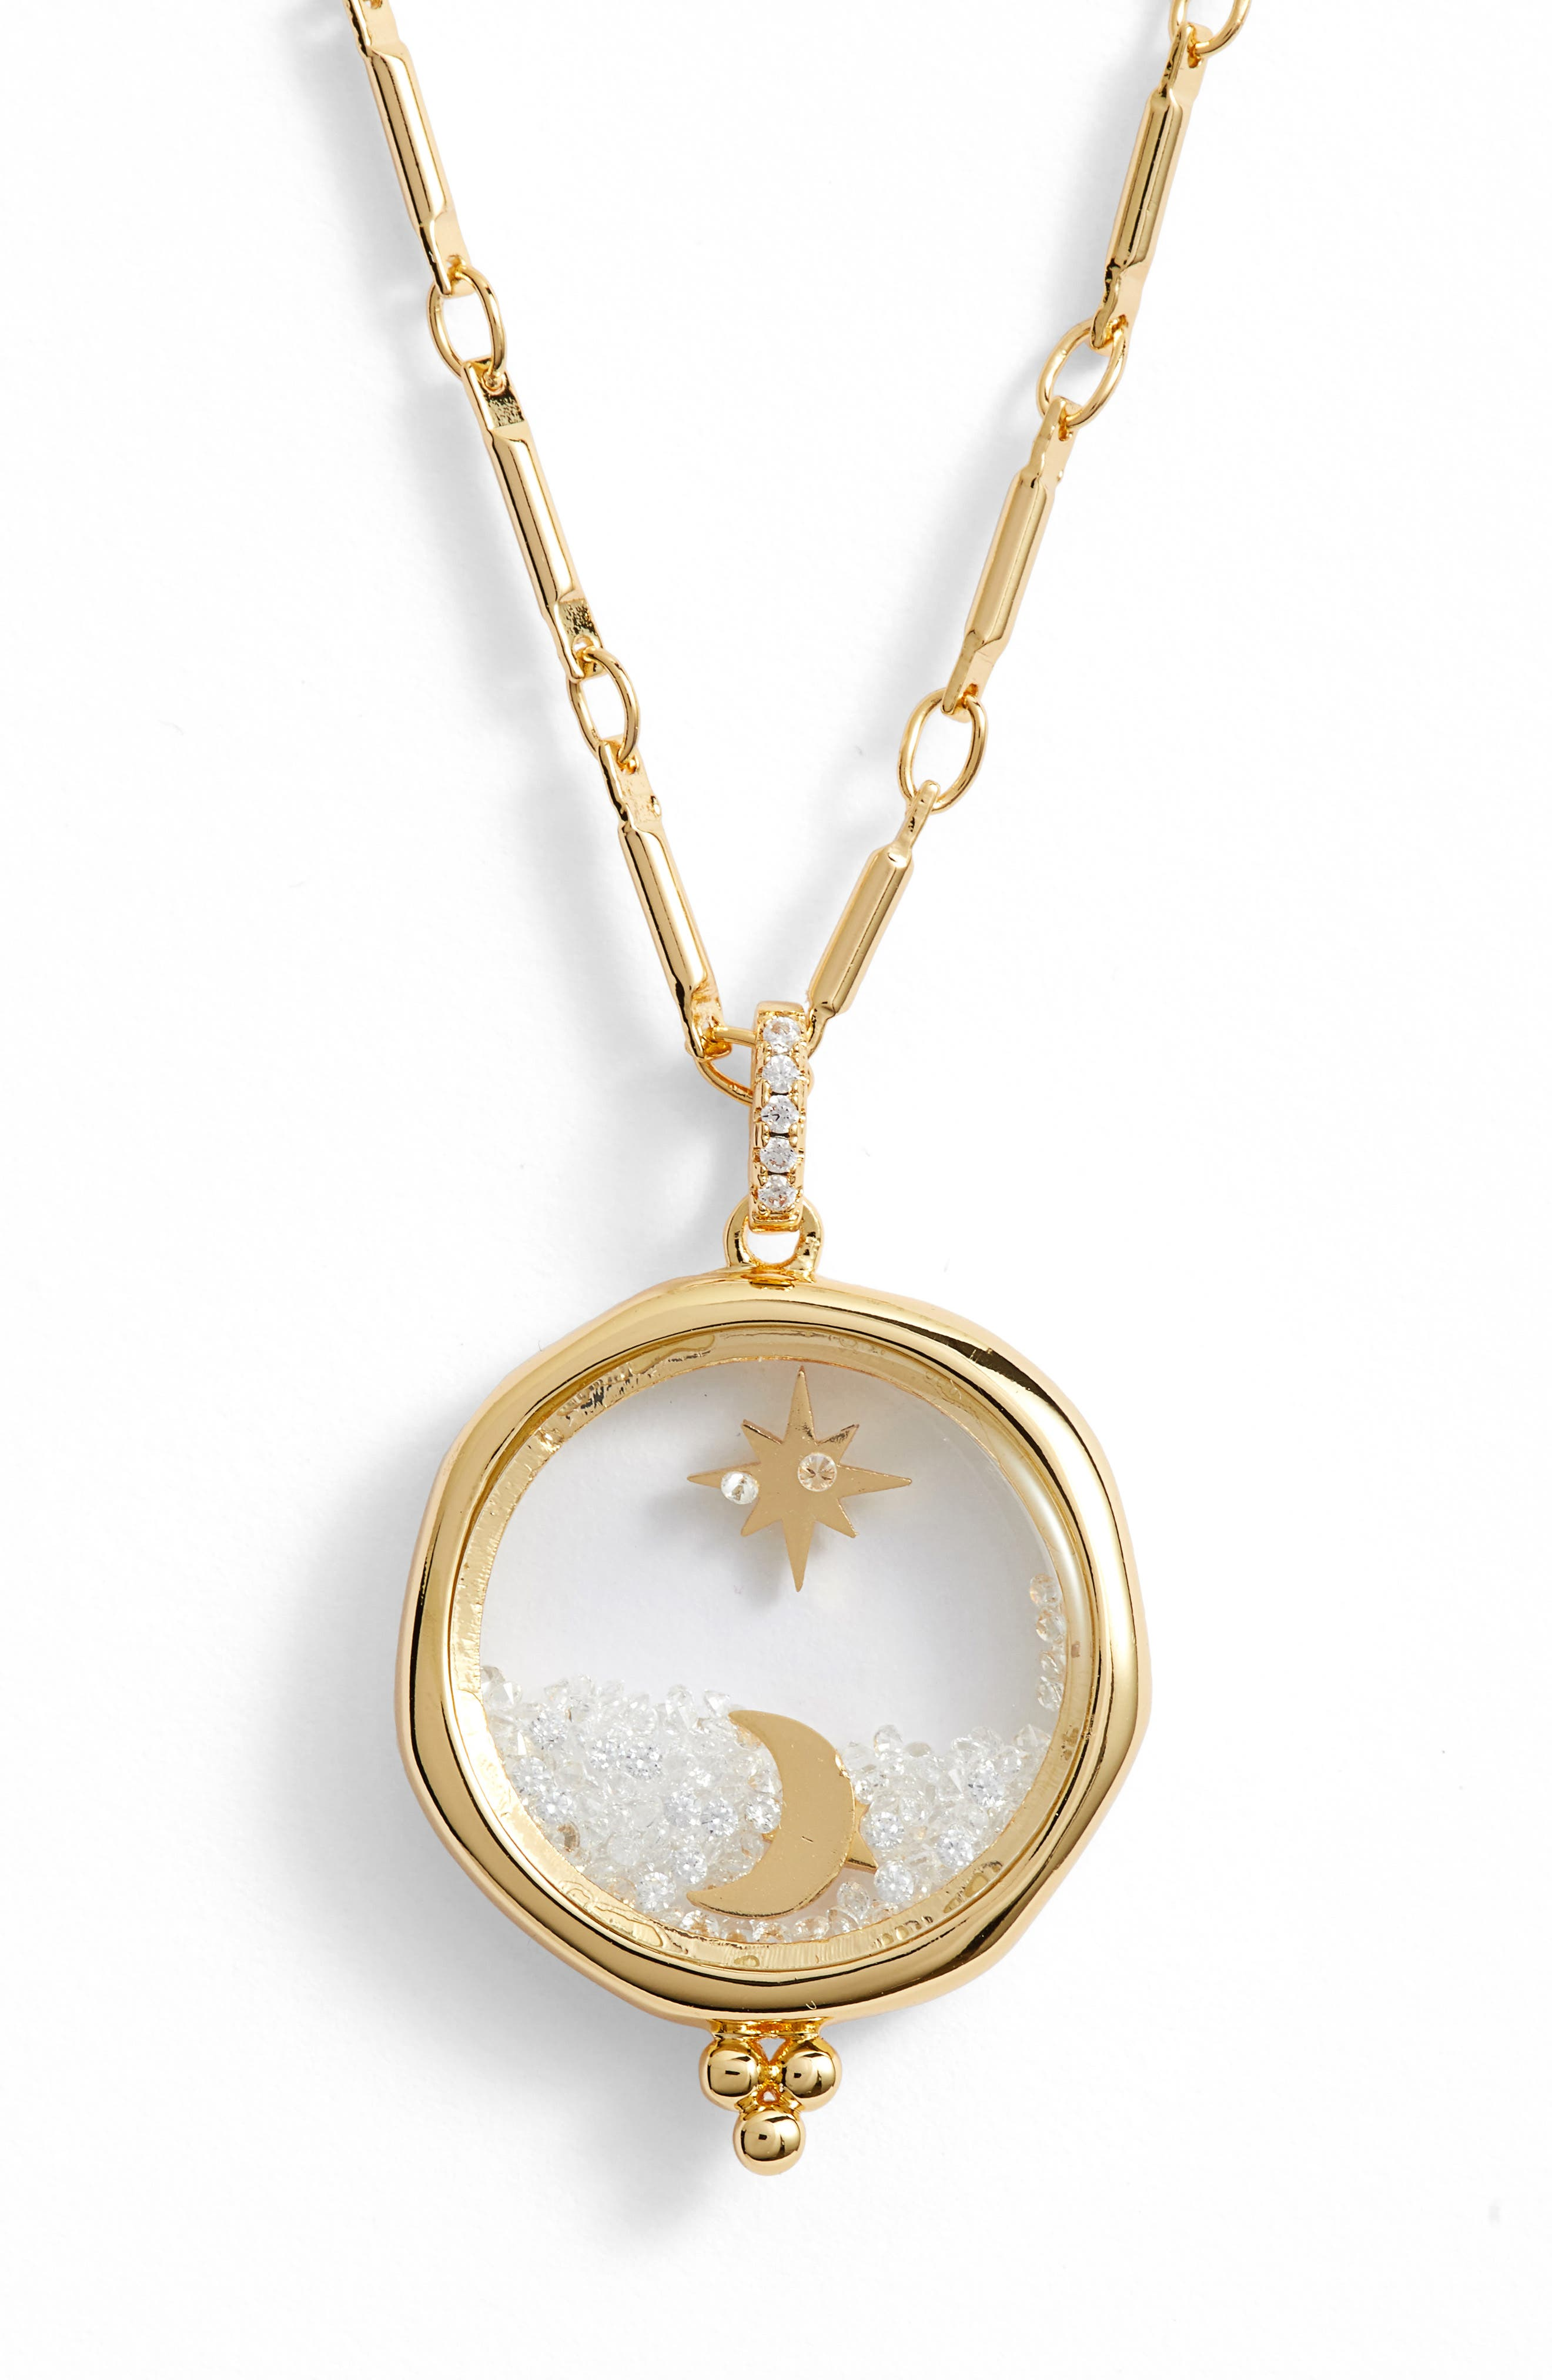 LULU DK X Kristina Schulman Universe Shaker Pendant Necklace in Gold